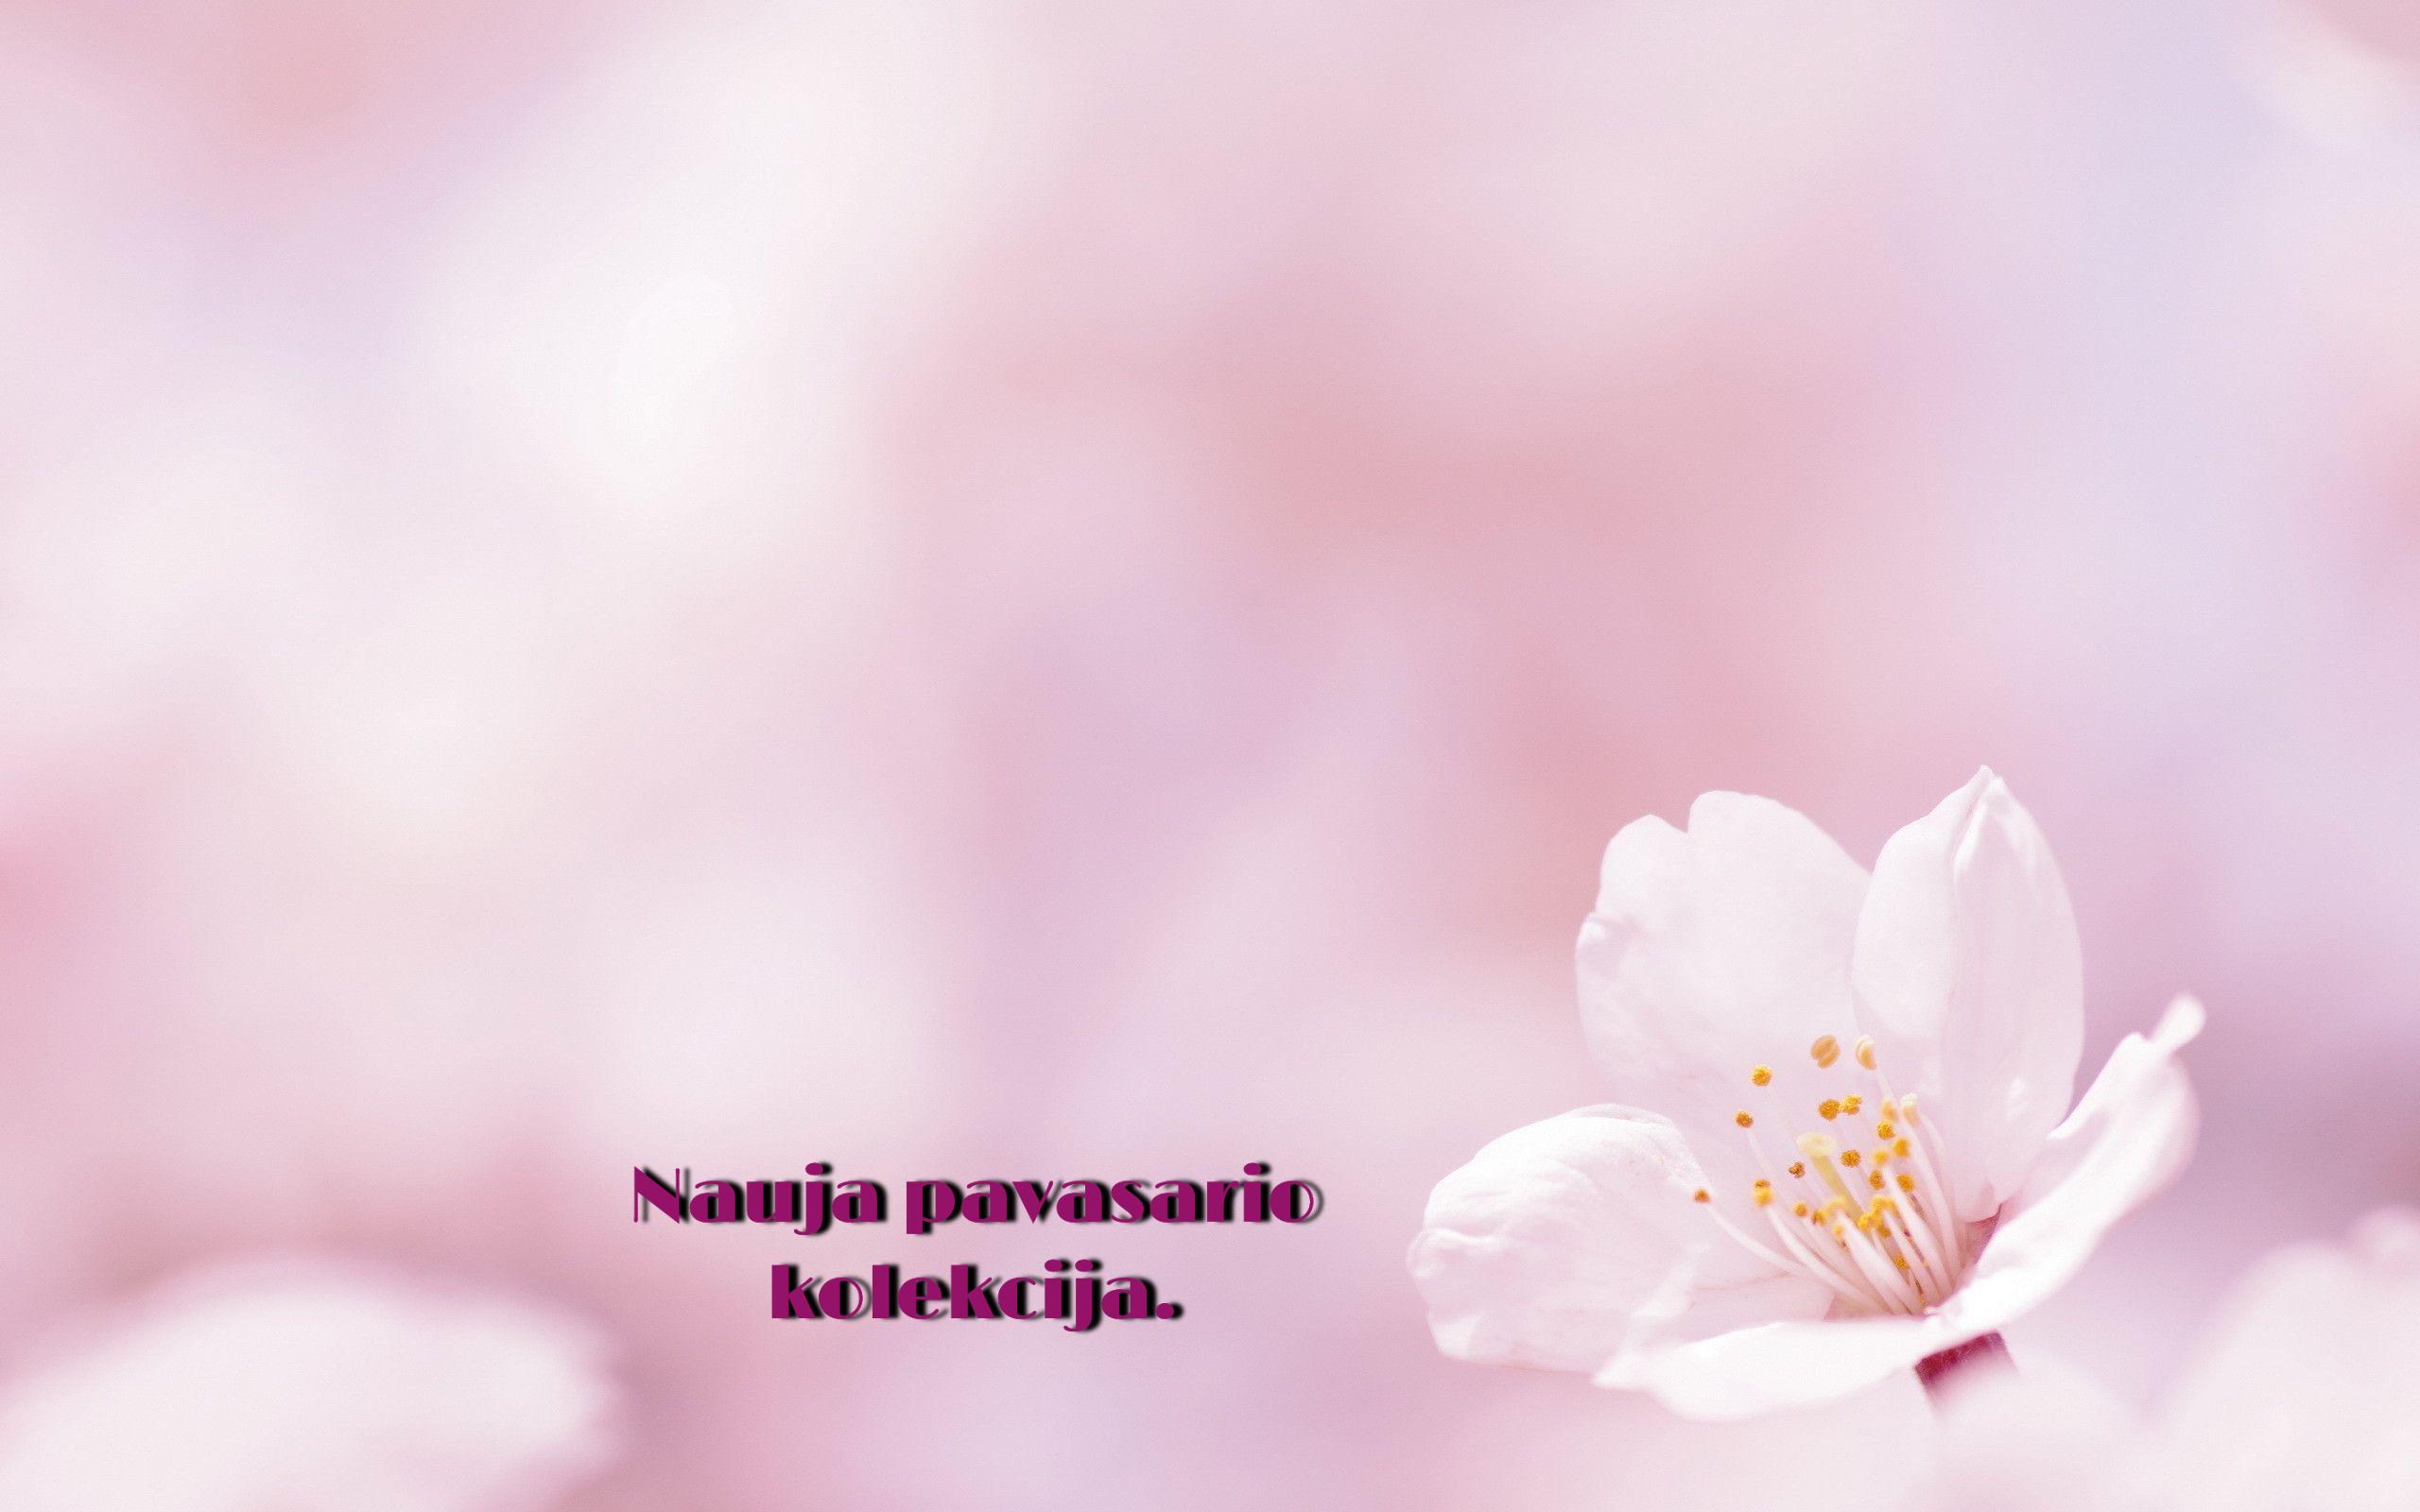 pavasarioo